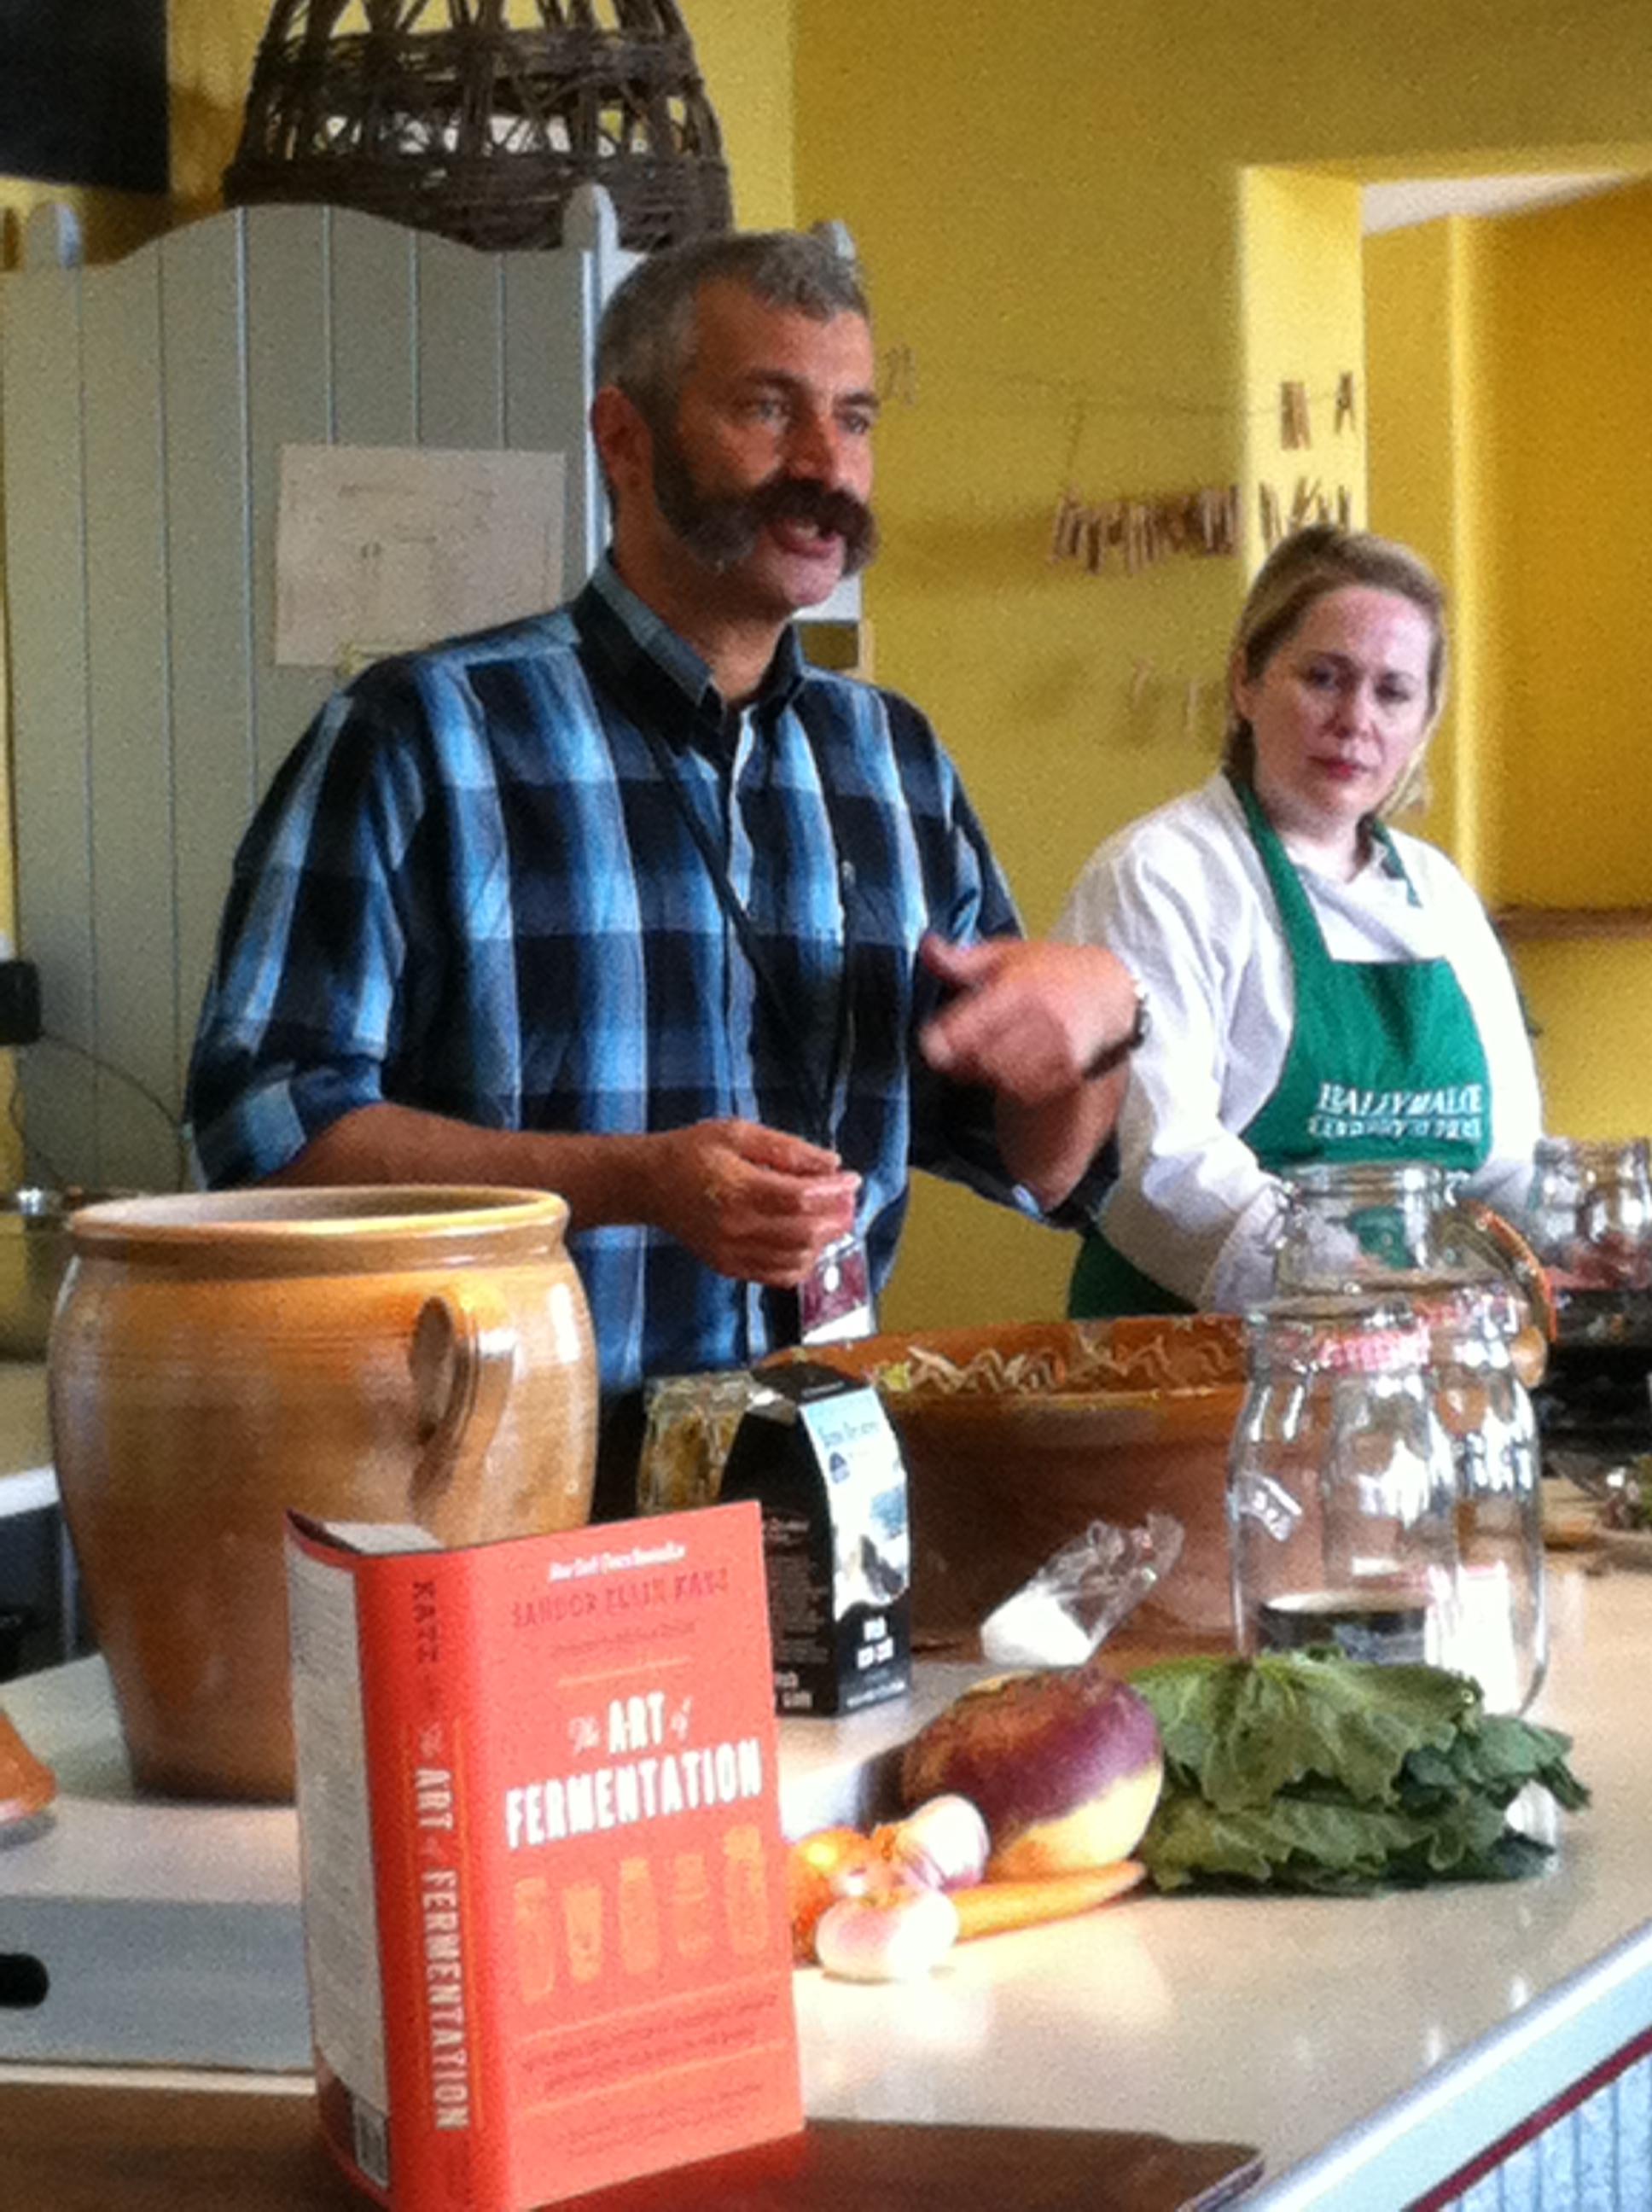 Bibliocook.com - Sandor Katz talks fermentation at Ballymaloe LifFest 2013